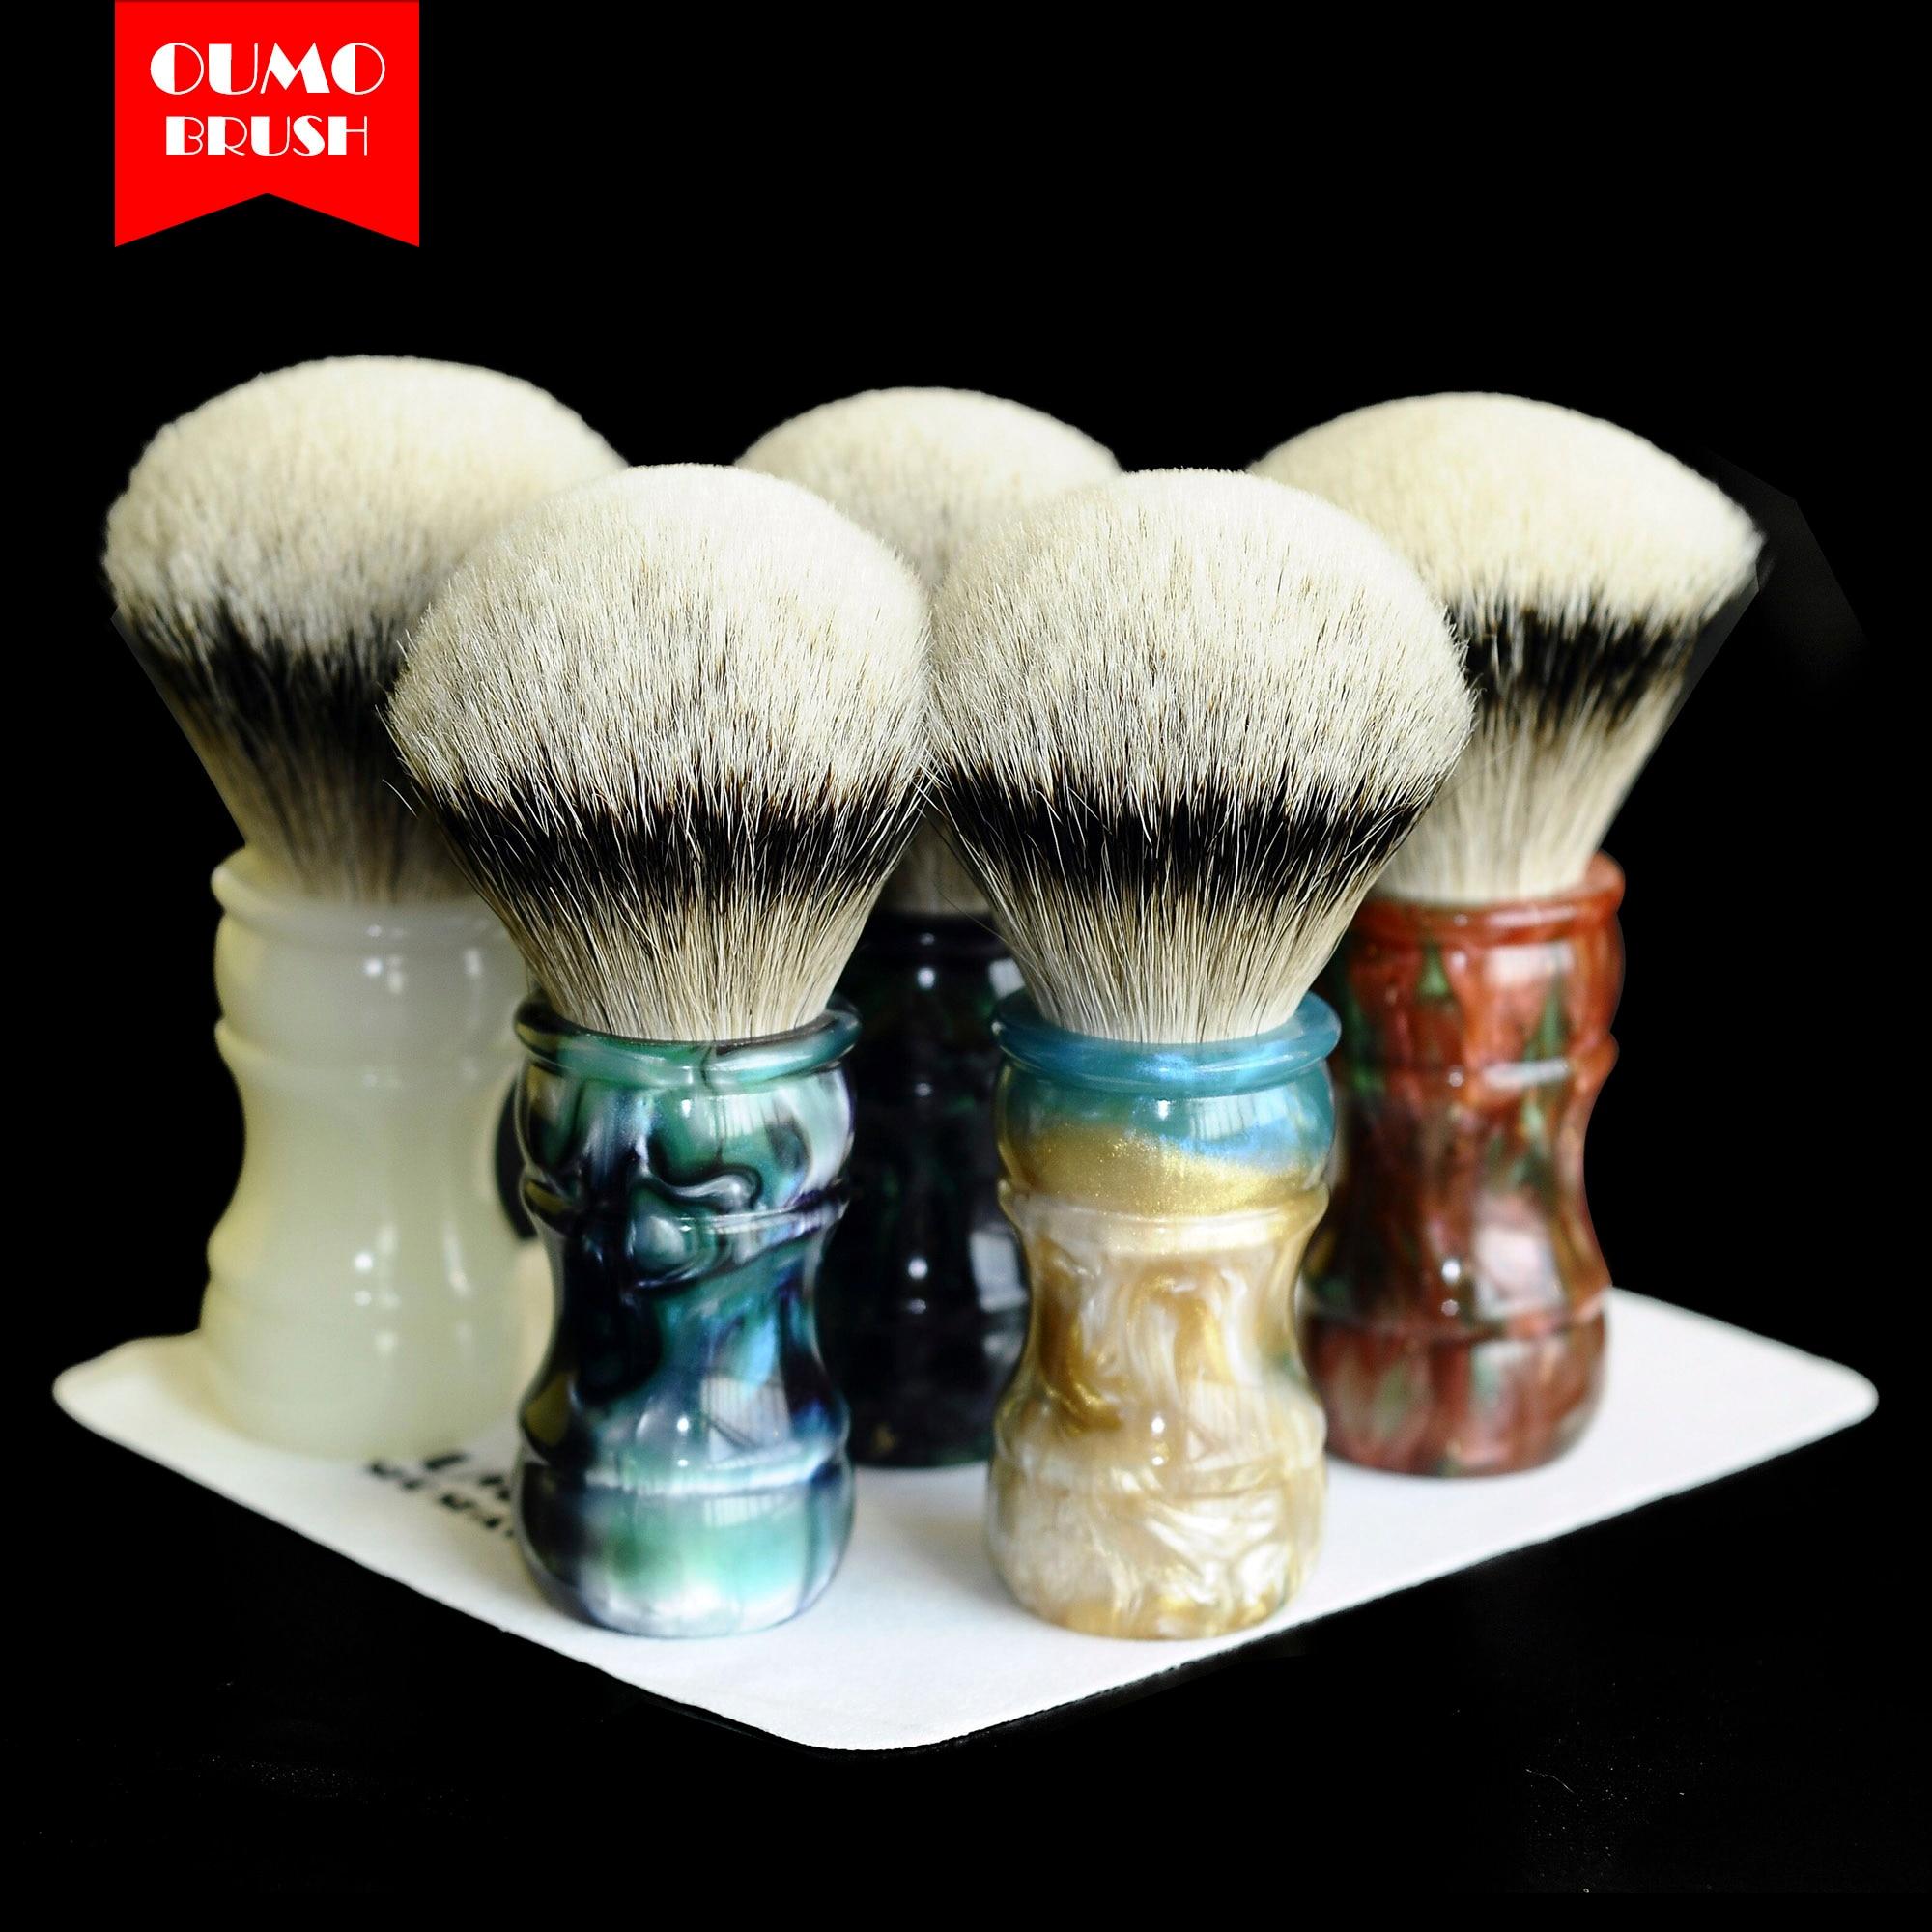 OUMO BRUSH - Terracotta Warriors Shaving Brush With SHD HMW Silvertip Badger Knots  Gel City 26MM28MM